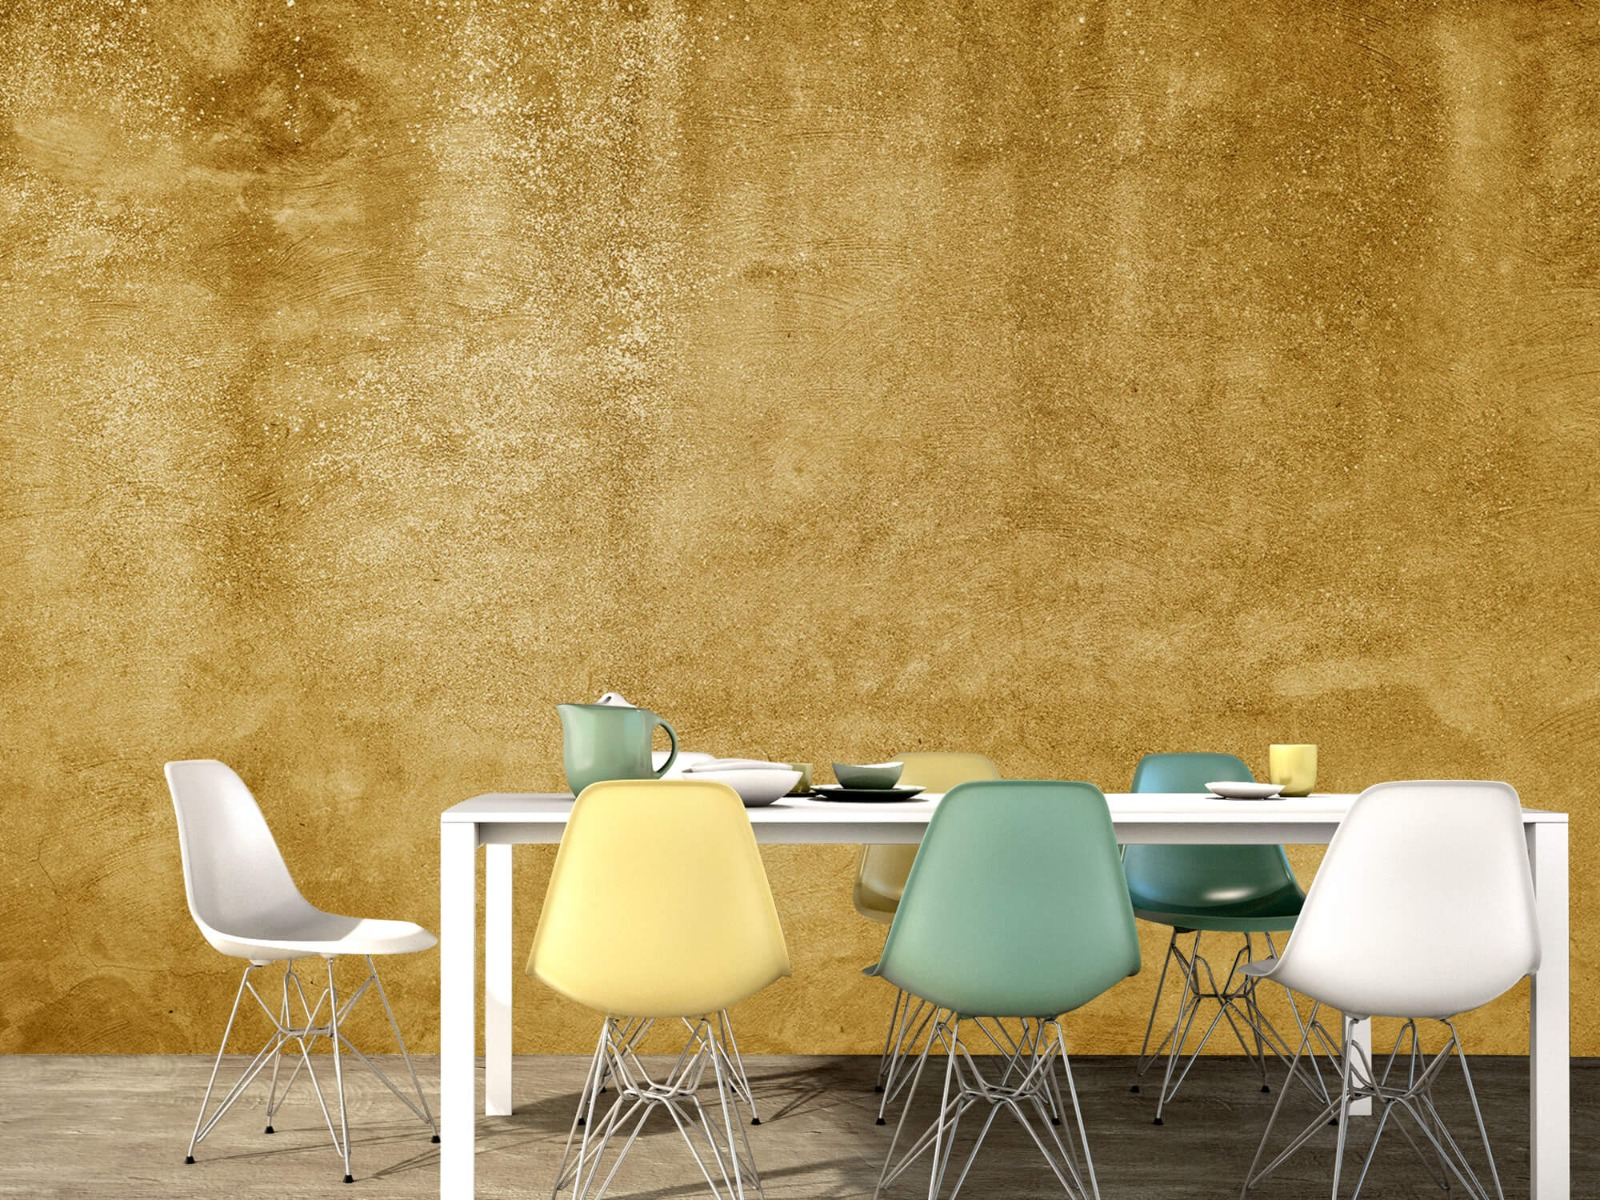 Betonlook behang - Oker geel beton - Woonkamer 15